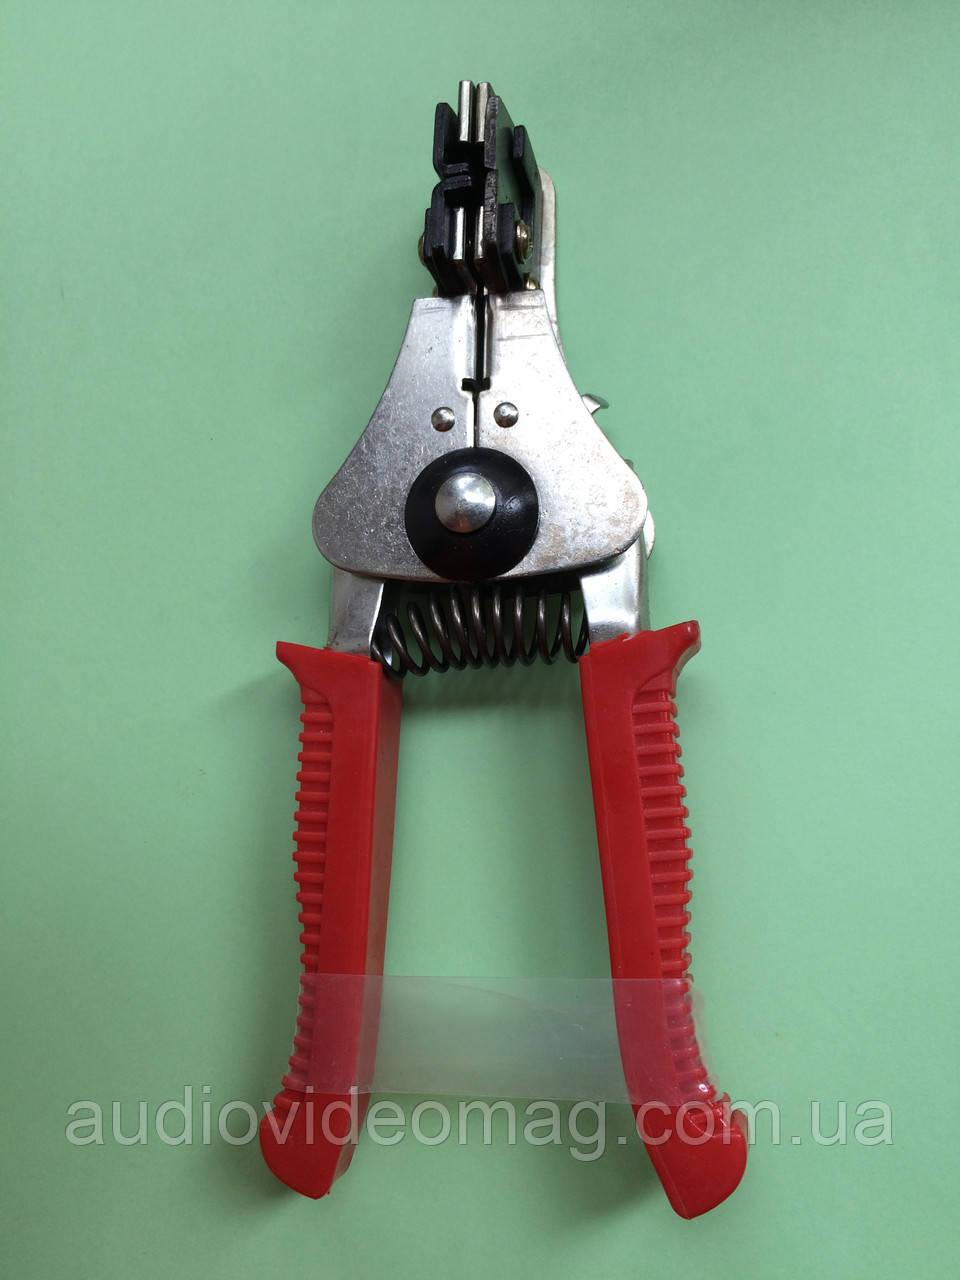 Инструмент для снятия изоляции с проводов от 0,5 до 2.2 мм. кв.